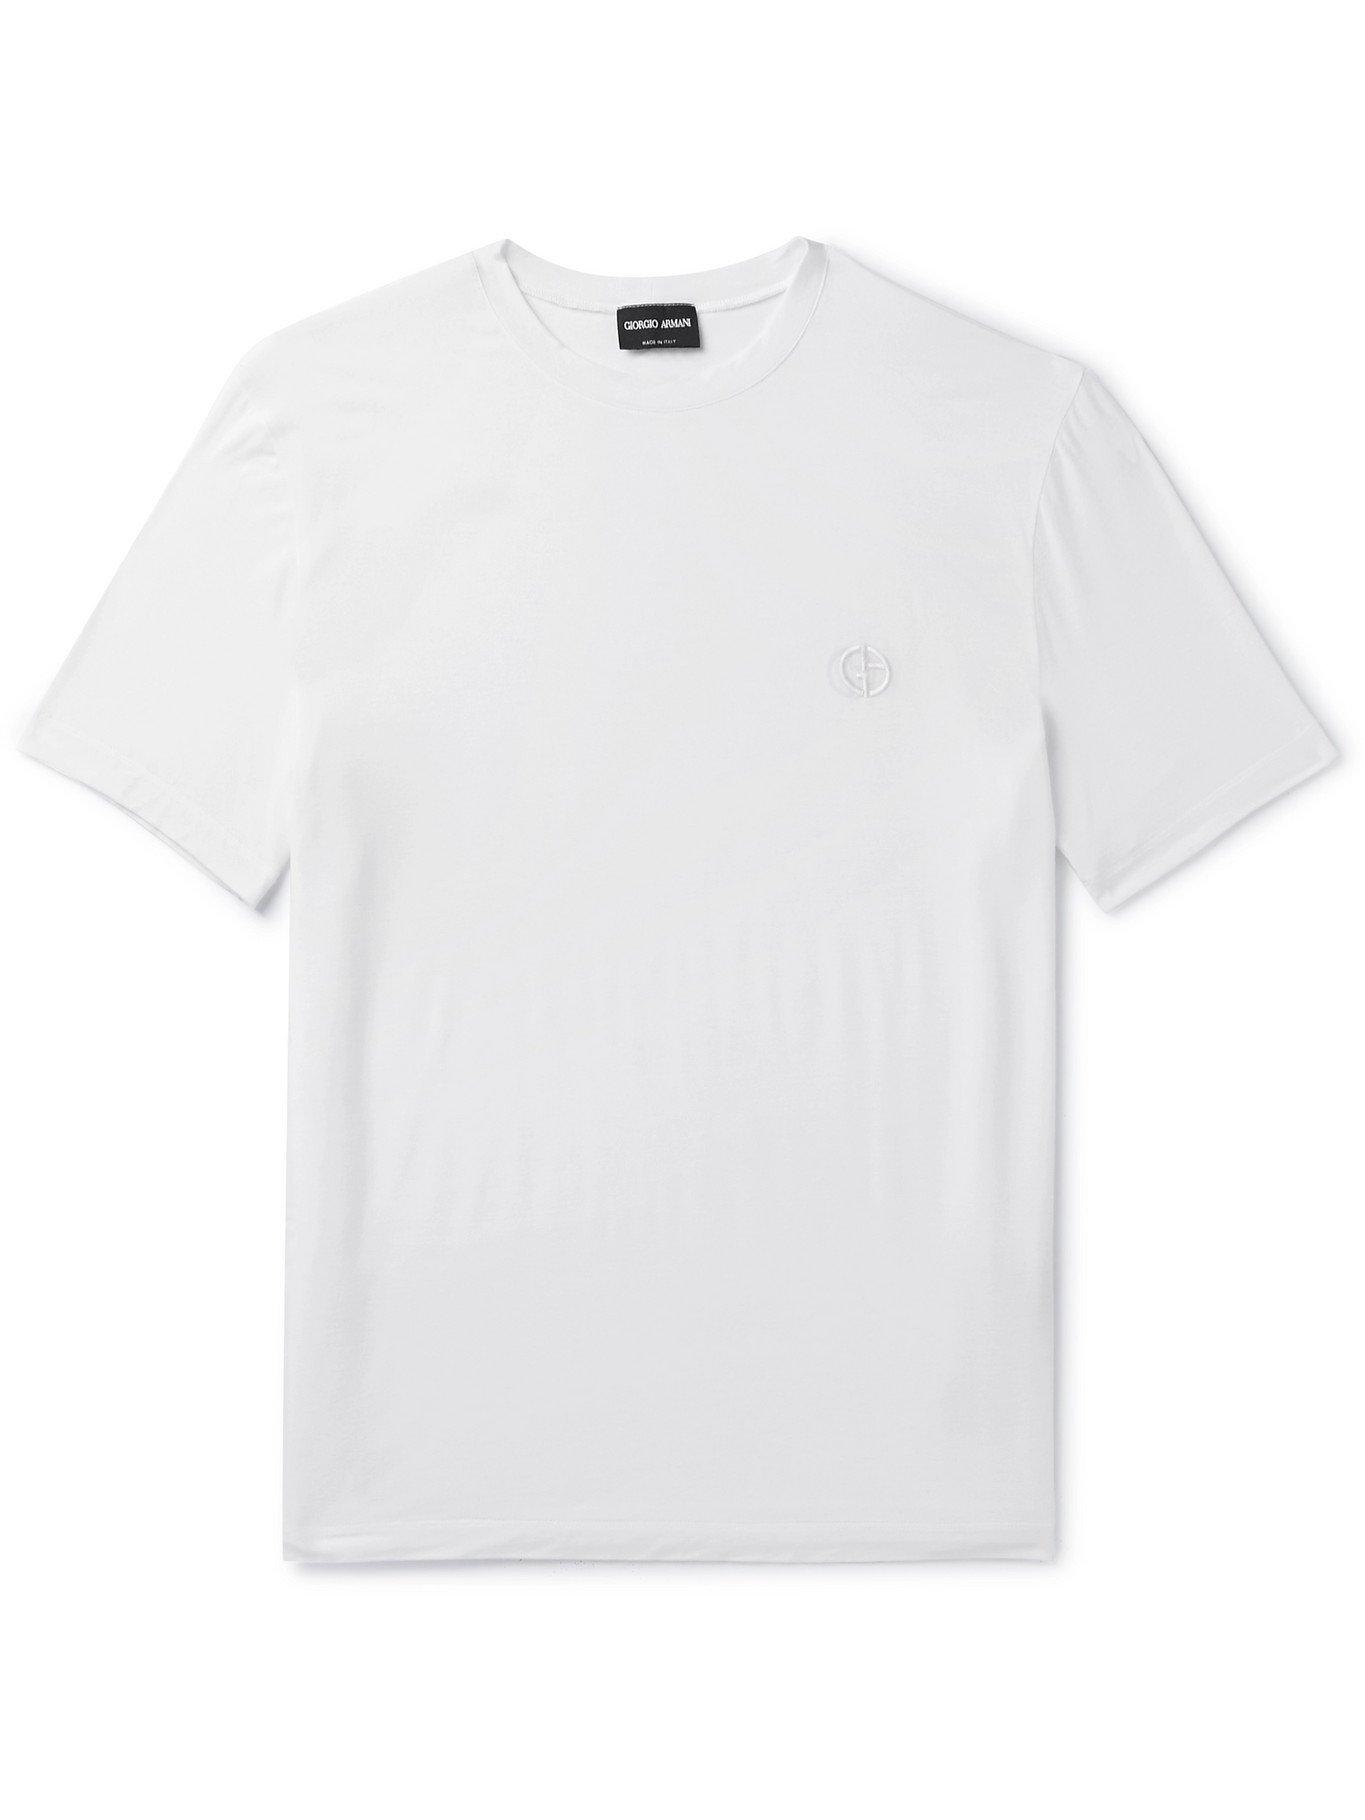 GIORGIO ARMANI - Slim-Fit Stretch-Jersey T-Shirt - White - IT 46